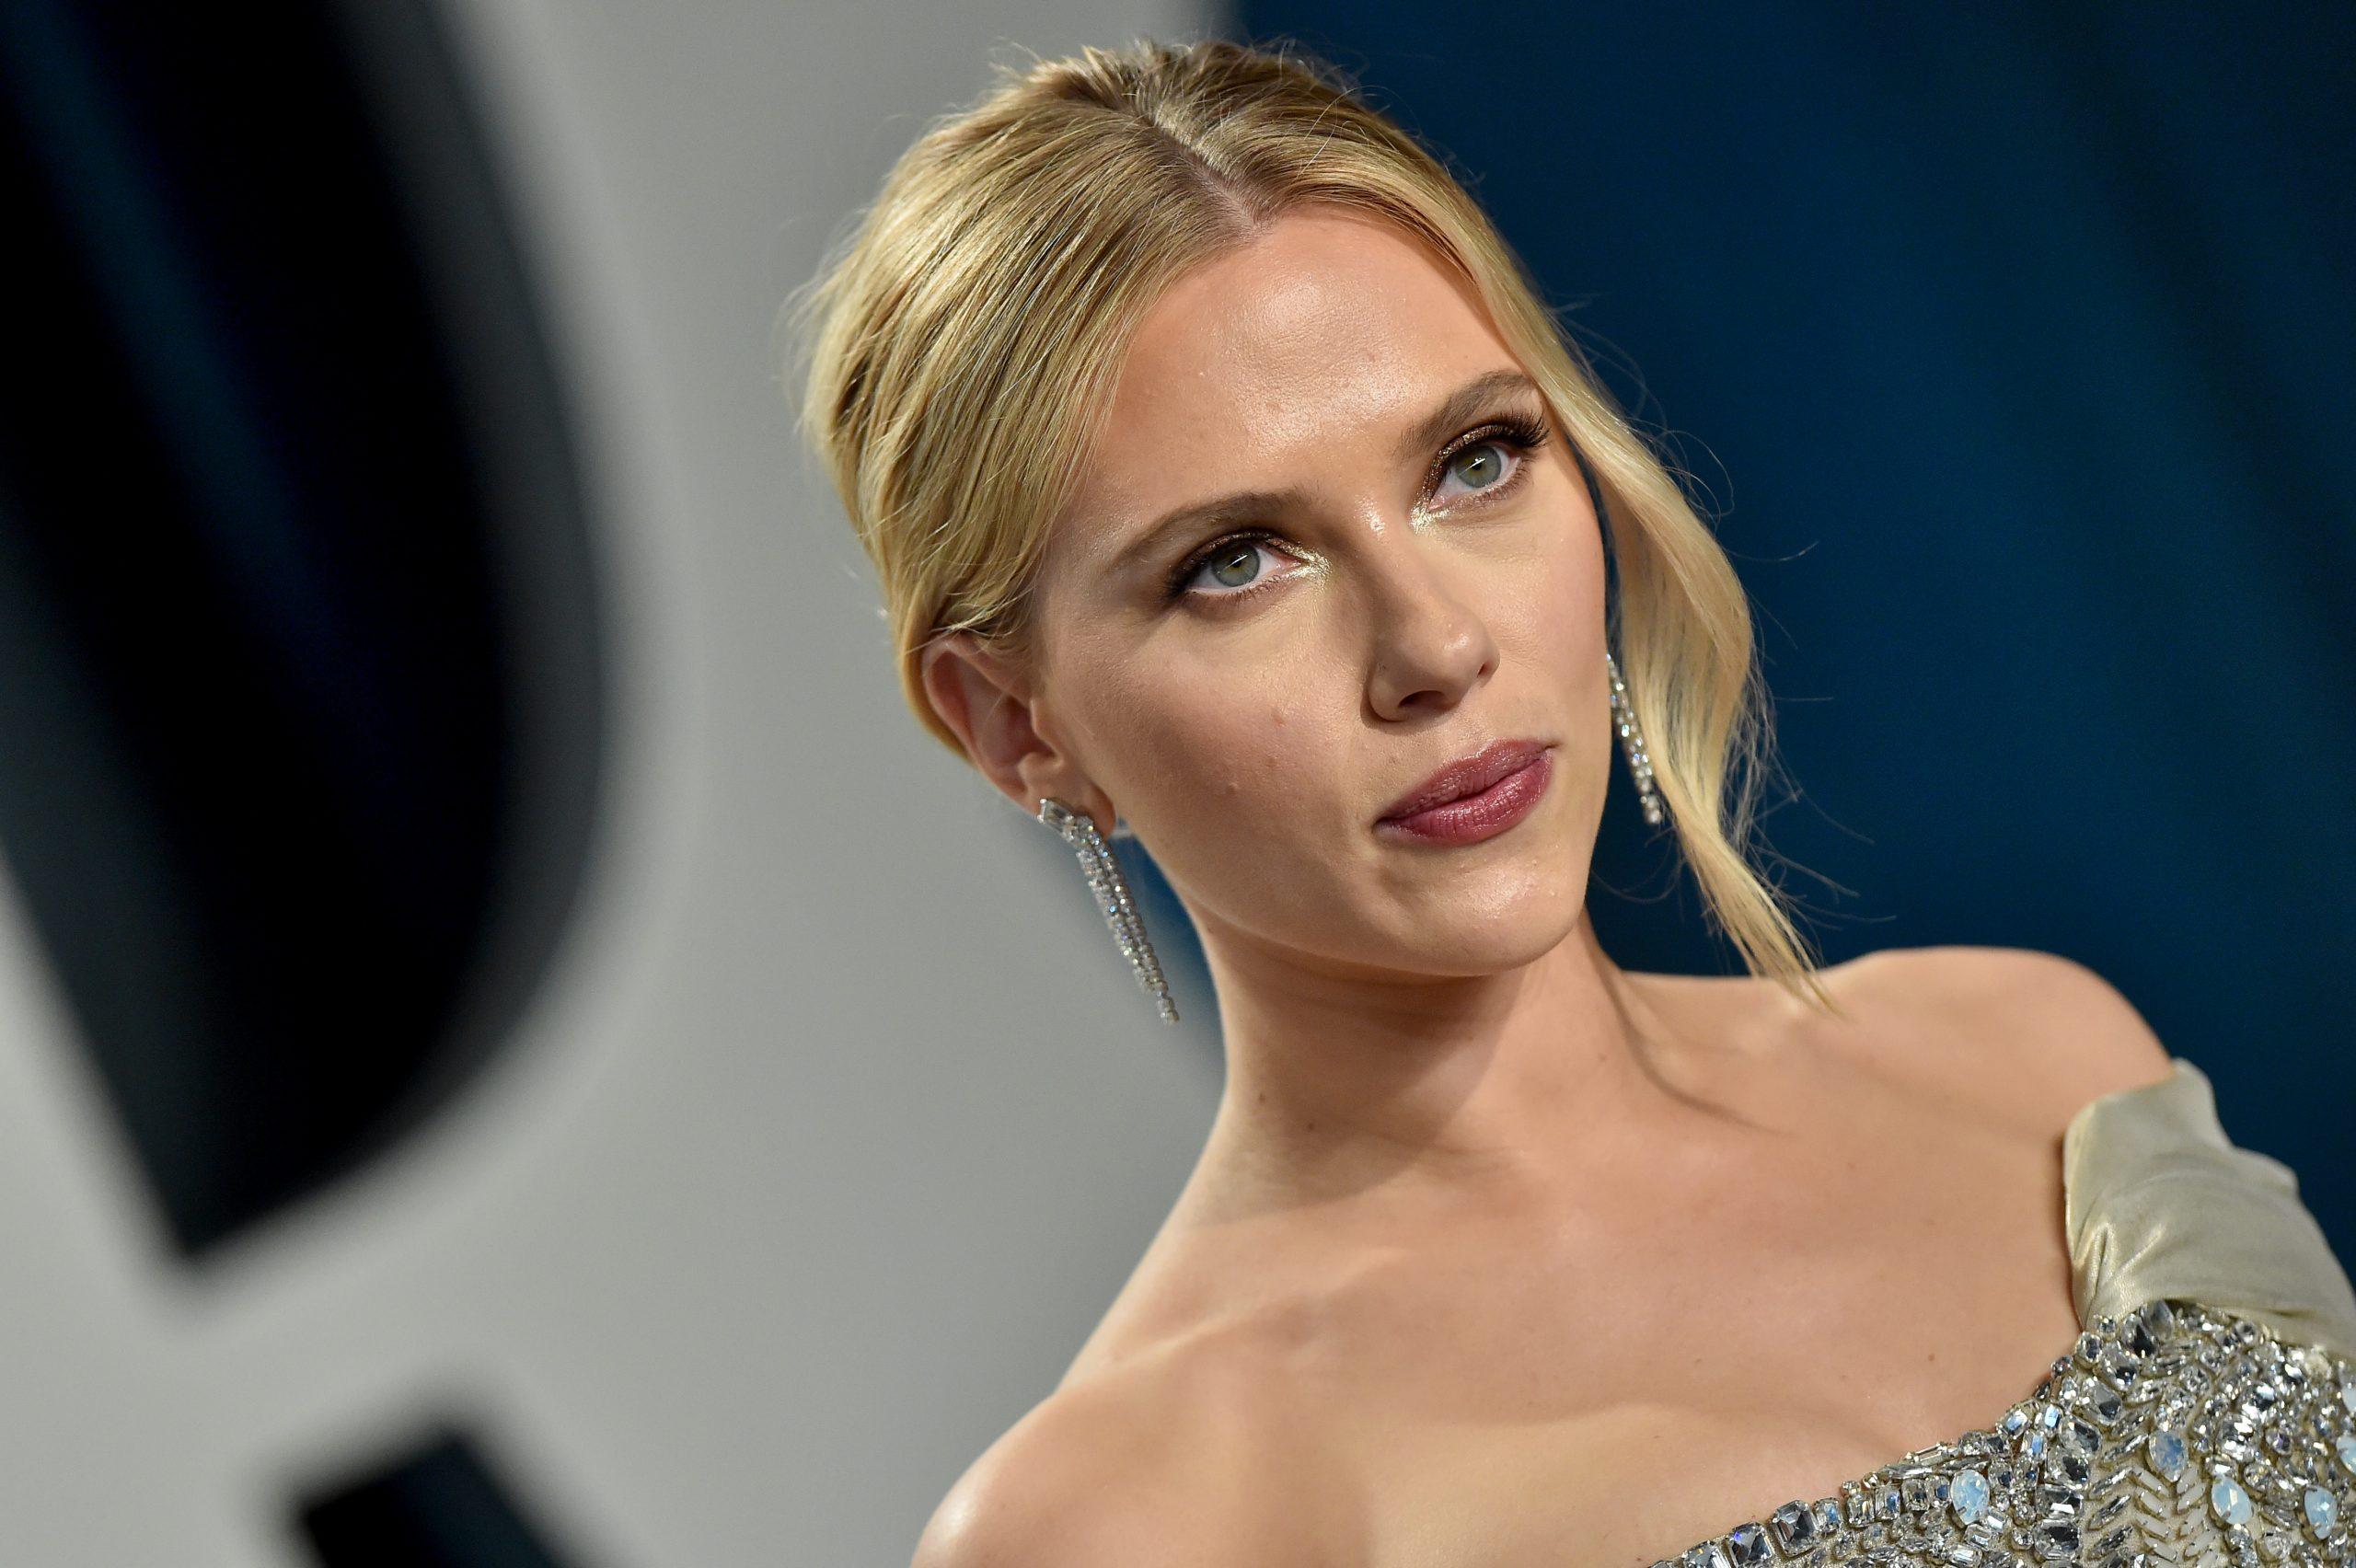 Scarlett Johansson attends the 2020 Vanity Fair Oscar Party hosted